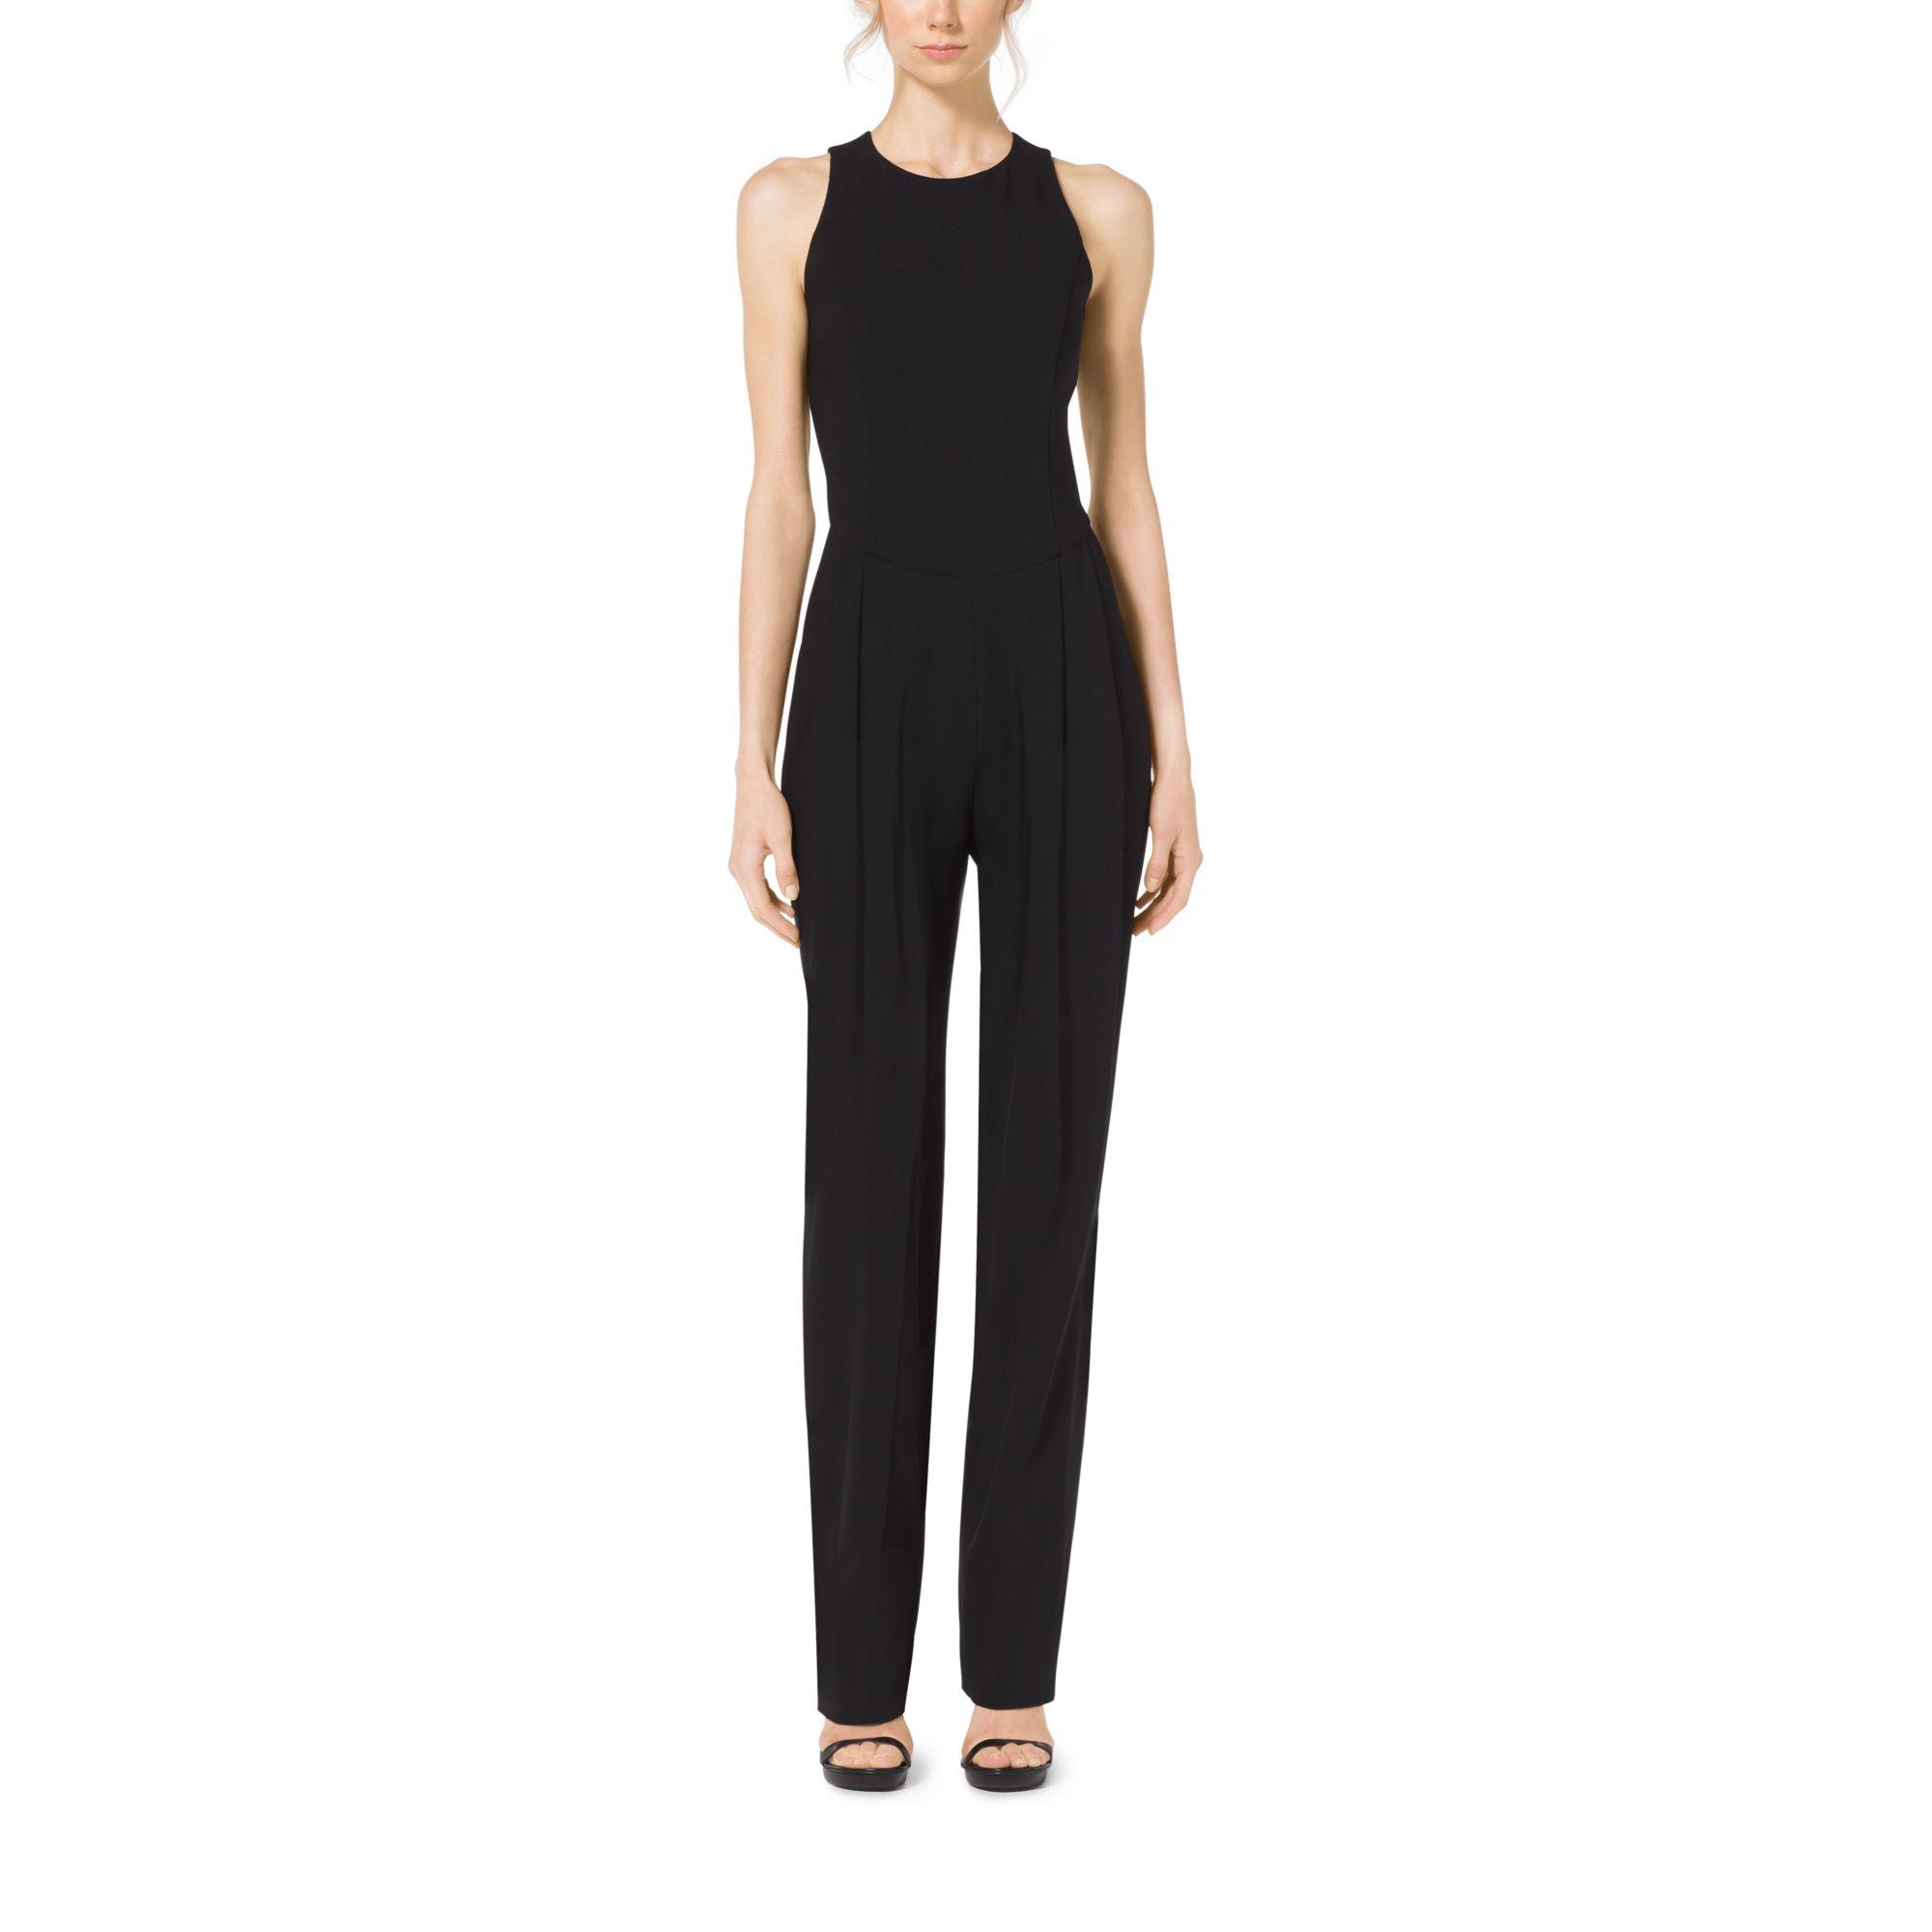 michael kors pebble crepe jumpsuit in black lyst. Black Bedroom Furniture Sets. Home Design Ideas